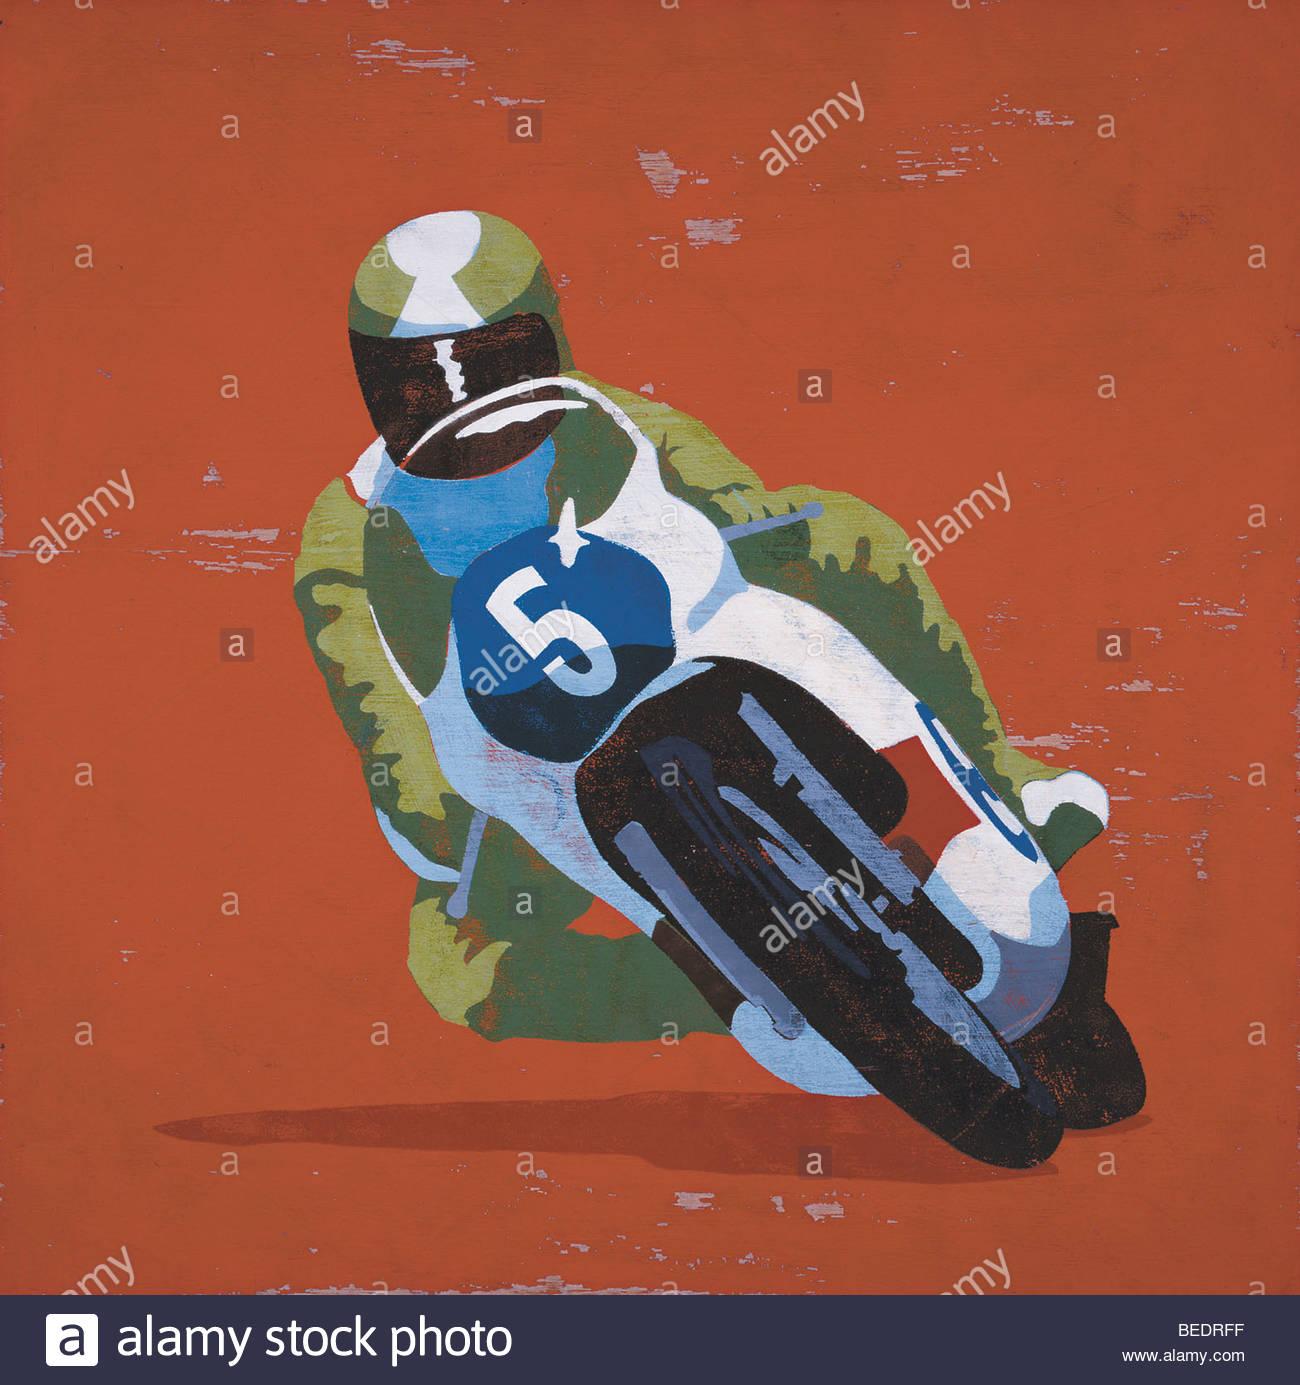 Professional rider su moto racing Immagini Stock